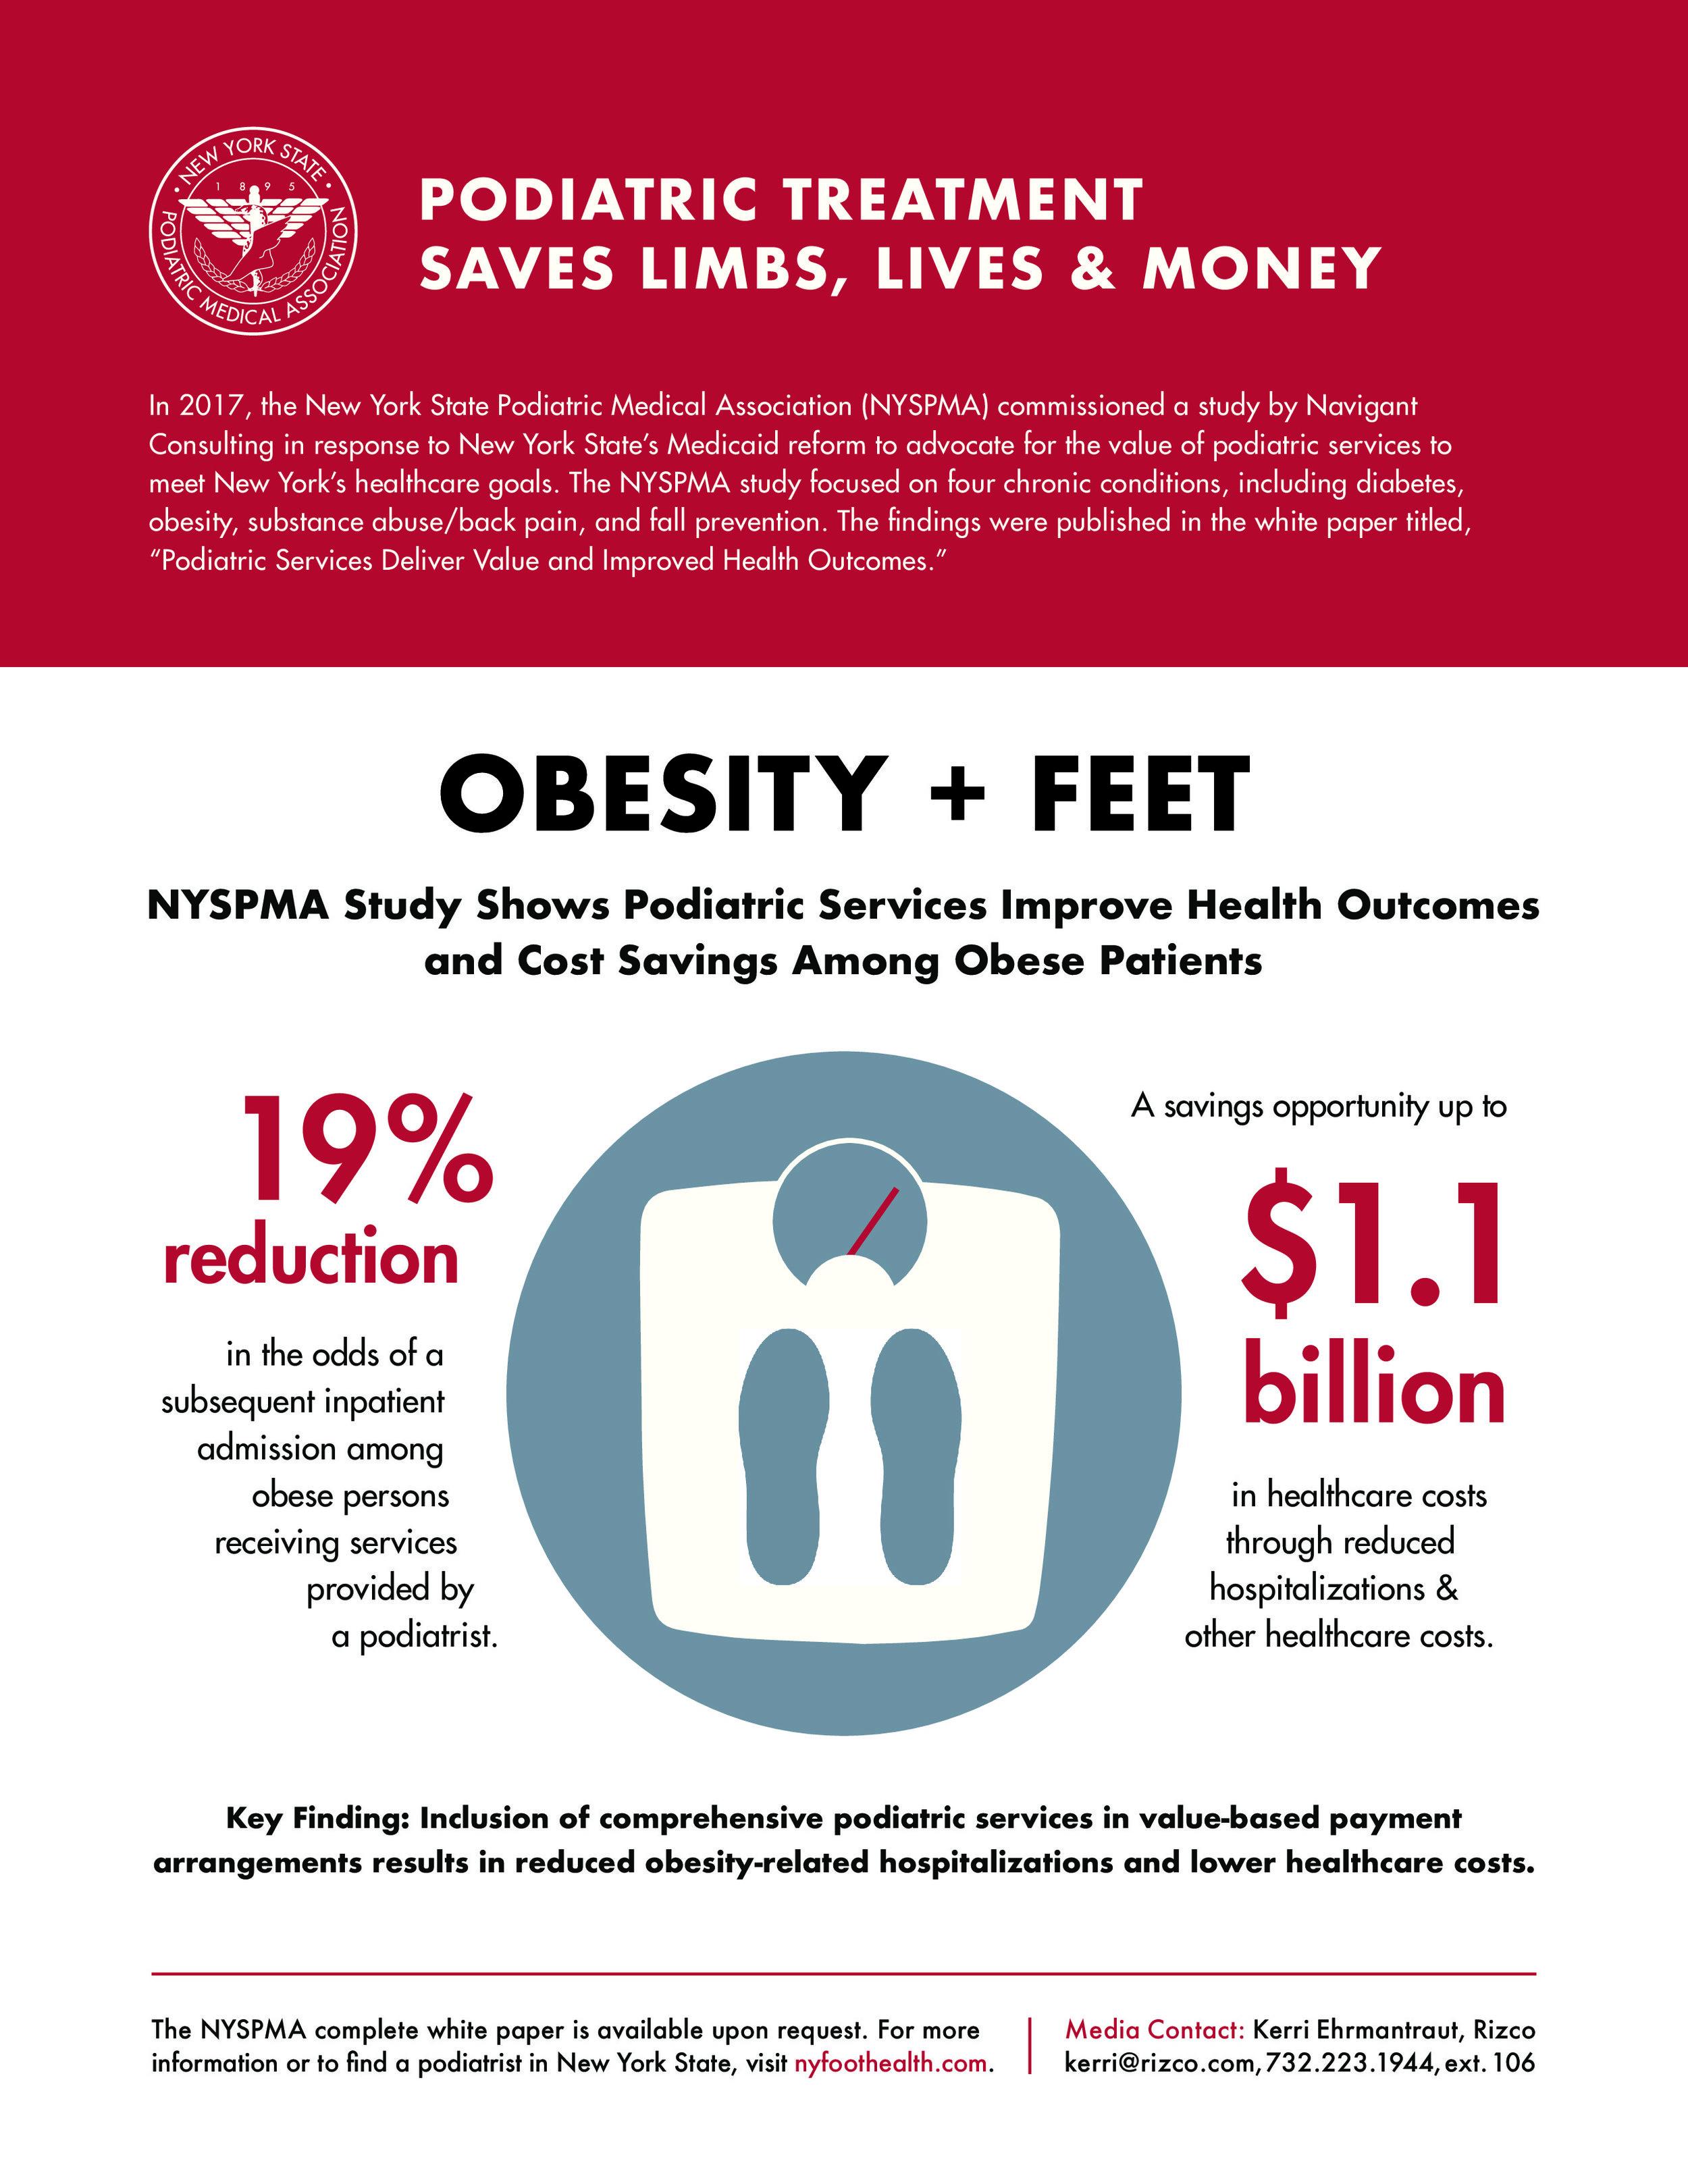 NYSPMA-WhitePaper-Infographic-Obesity-page-0.jpg